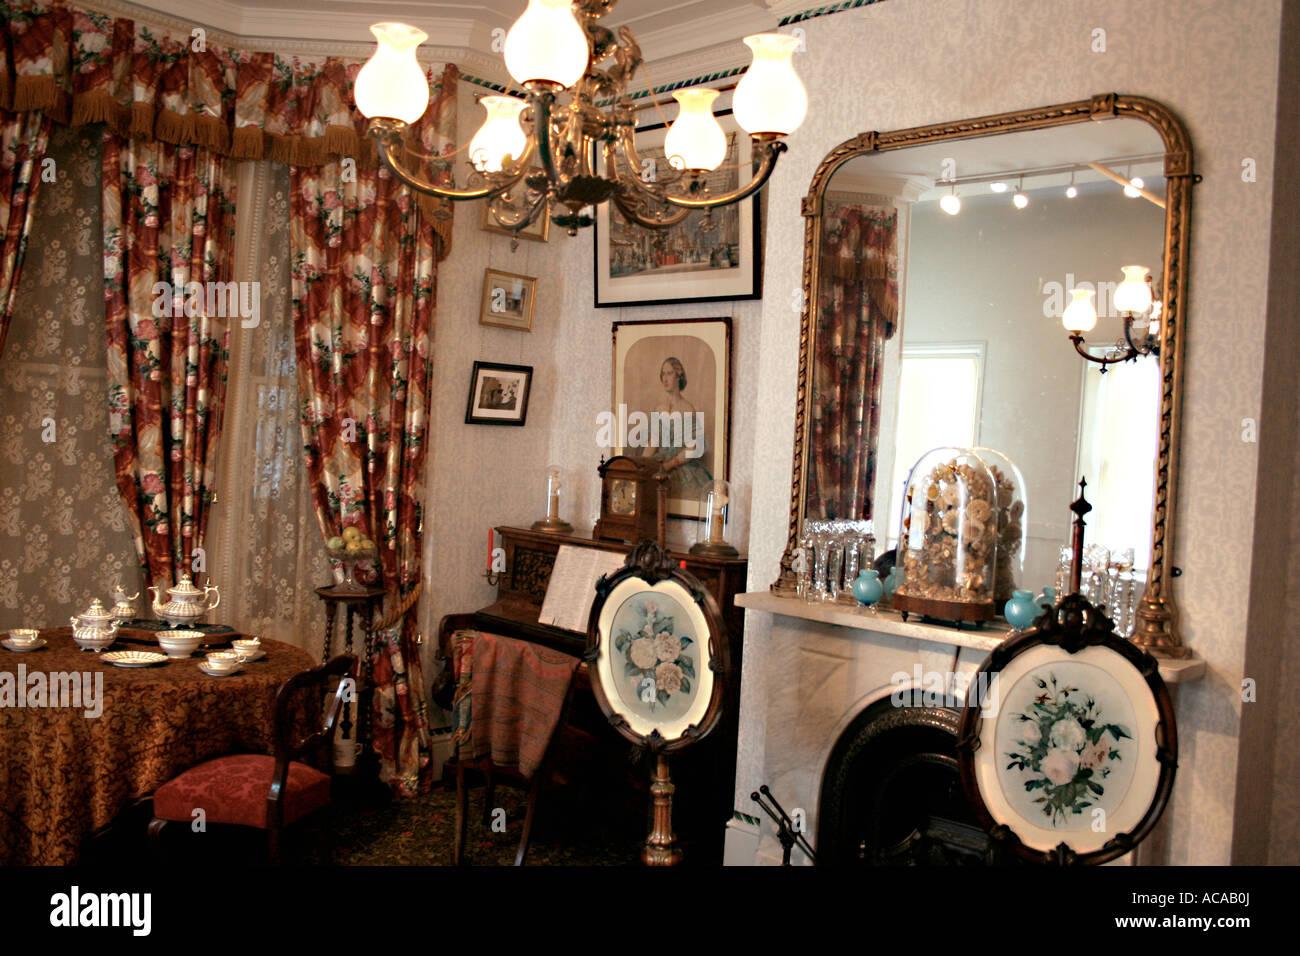 Ordinaire Vintage Period Room   Stock Image